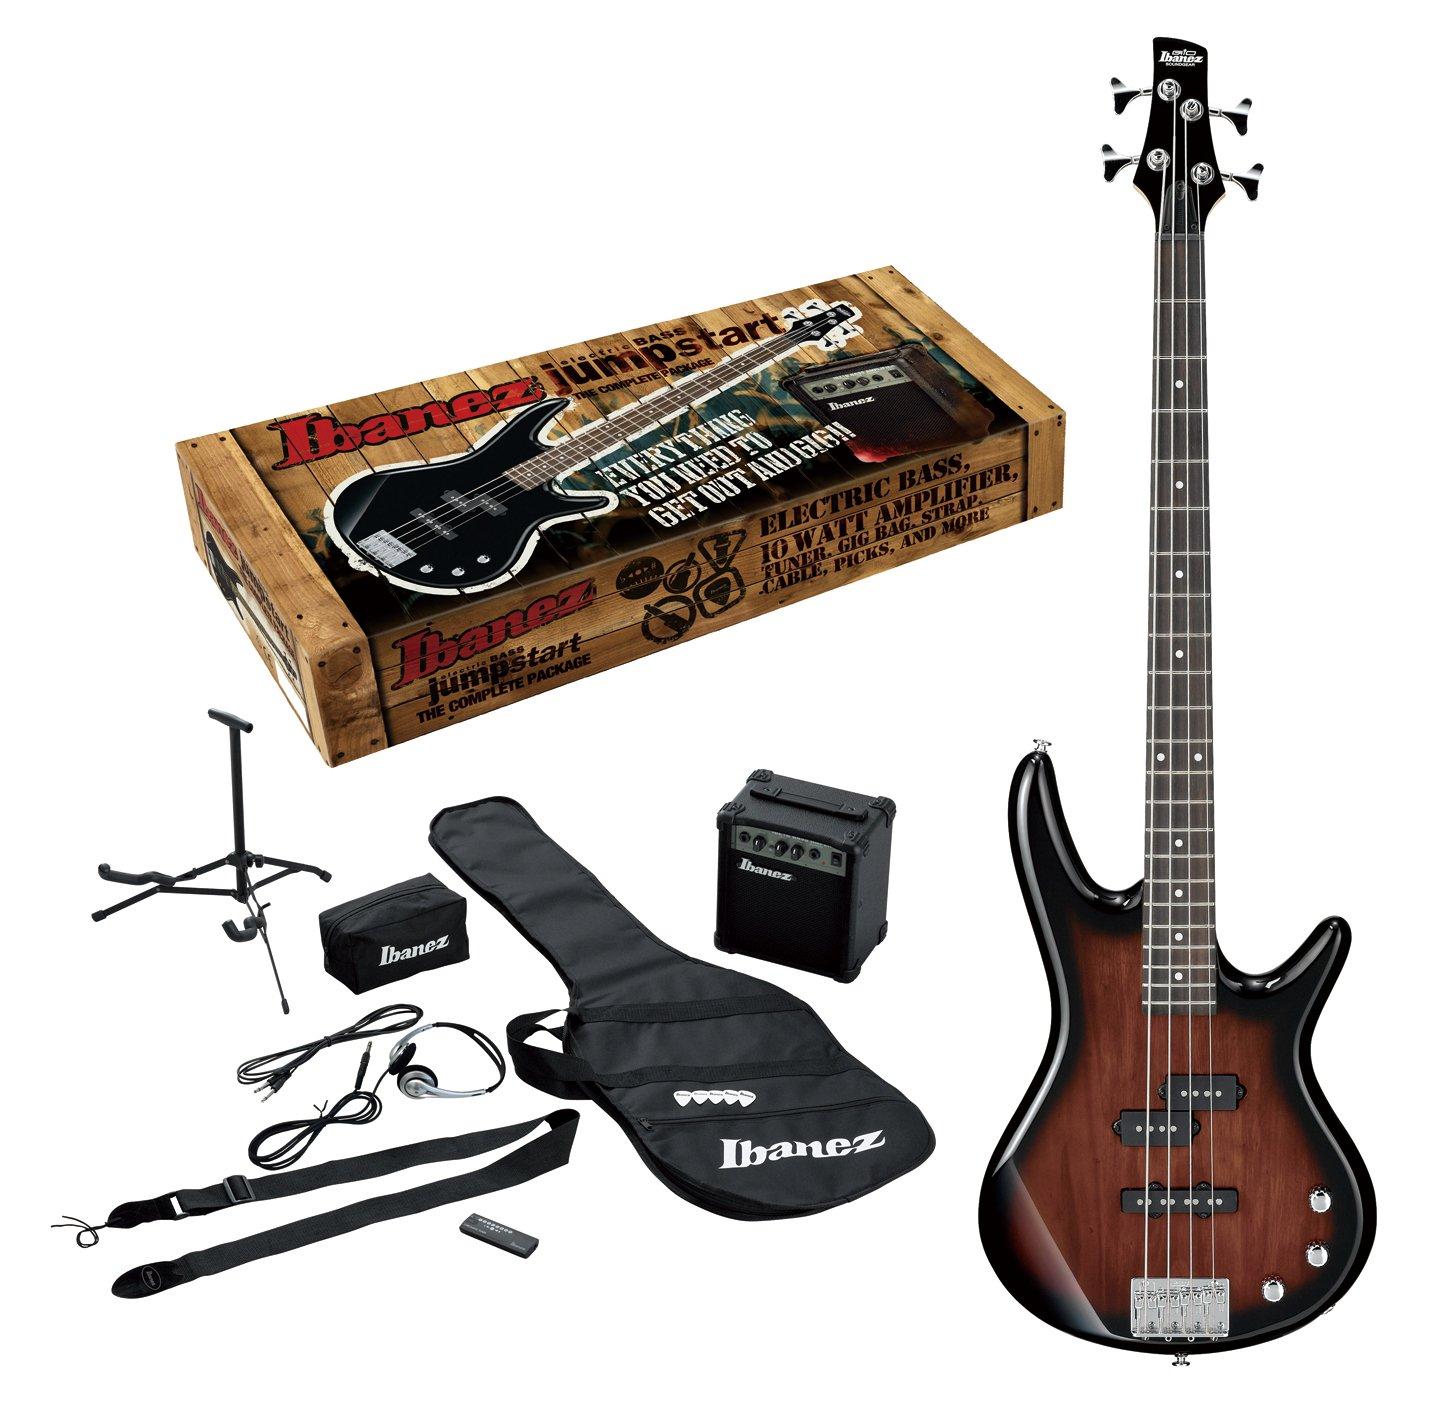 Ibanez IJXB150BWNS Electric Bass Guitar